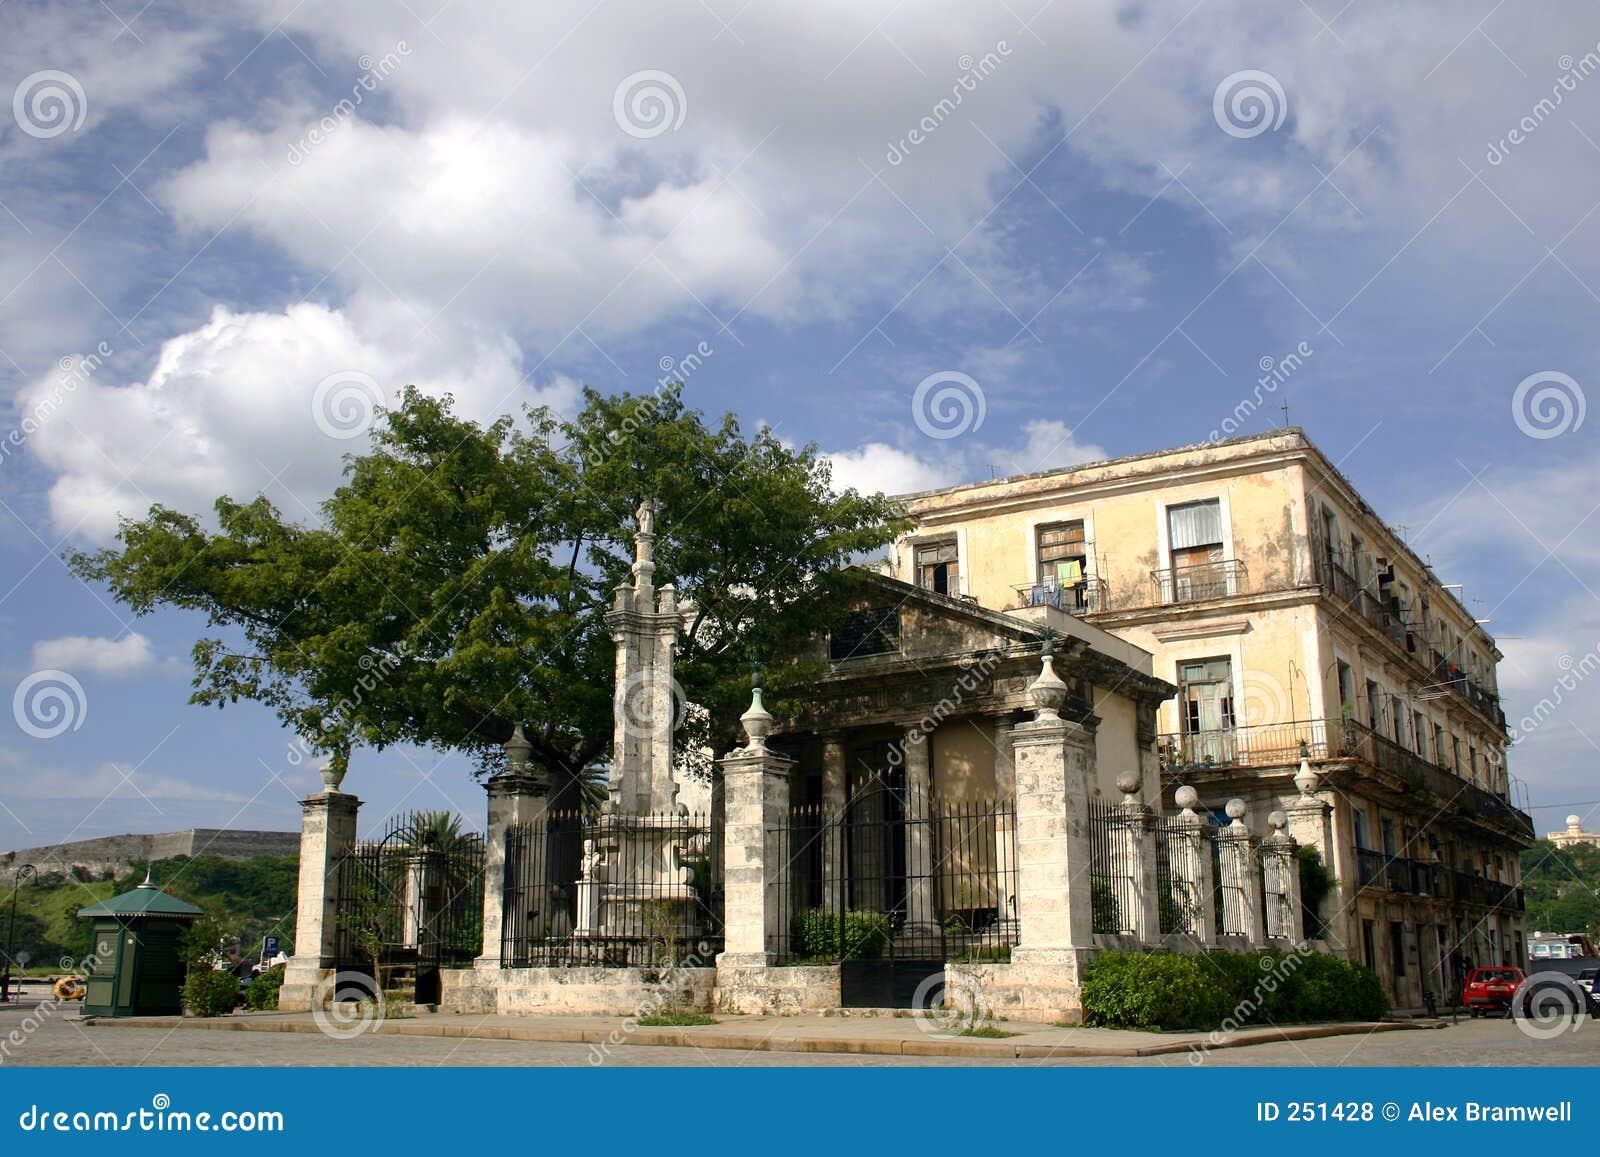 Cuban Mansion Royalty Free Stock Photos Image 251428